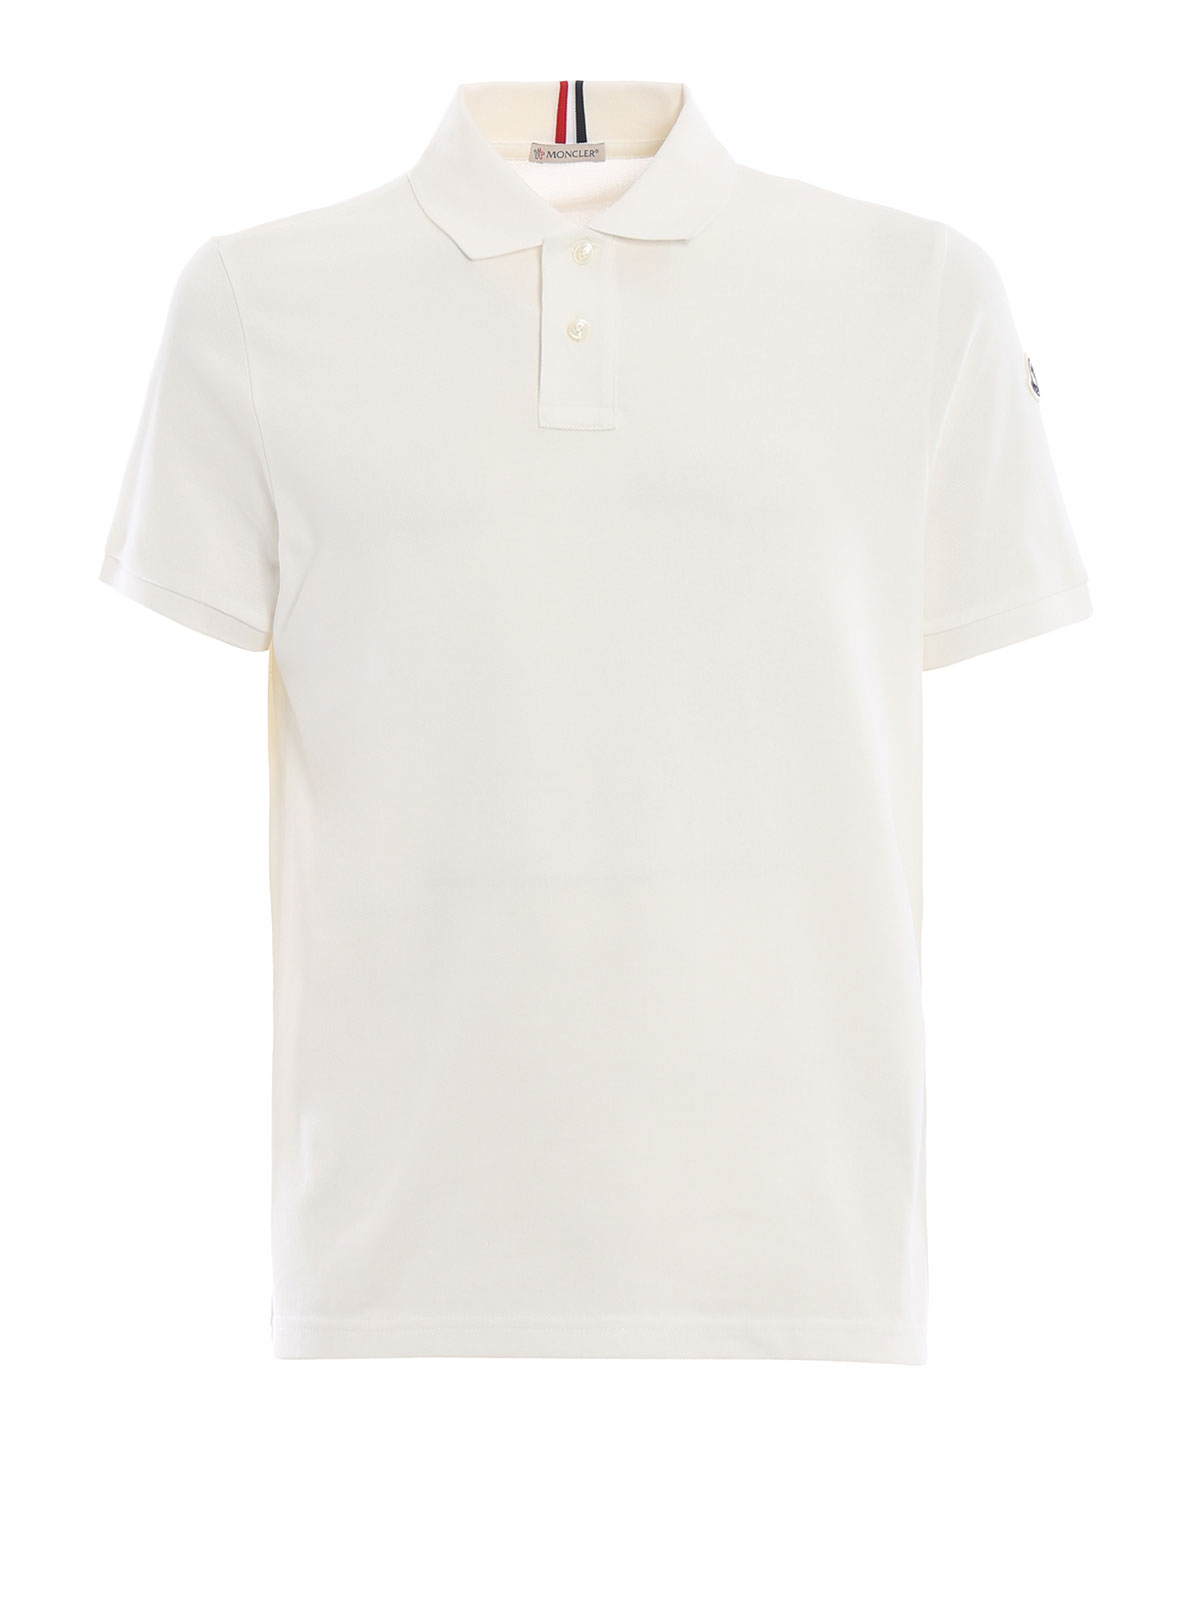 Moncler - Polo - Blanc - Polos - D2 091 8306200 84556 004   iKRIX.com 08ad64451e0